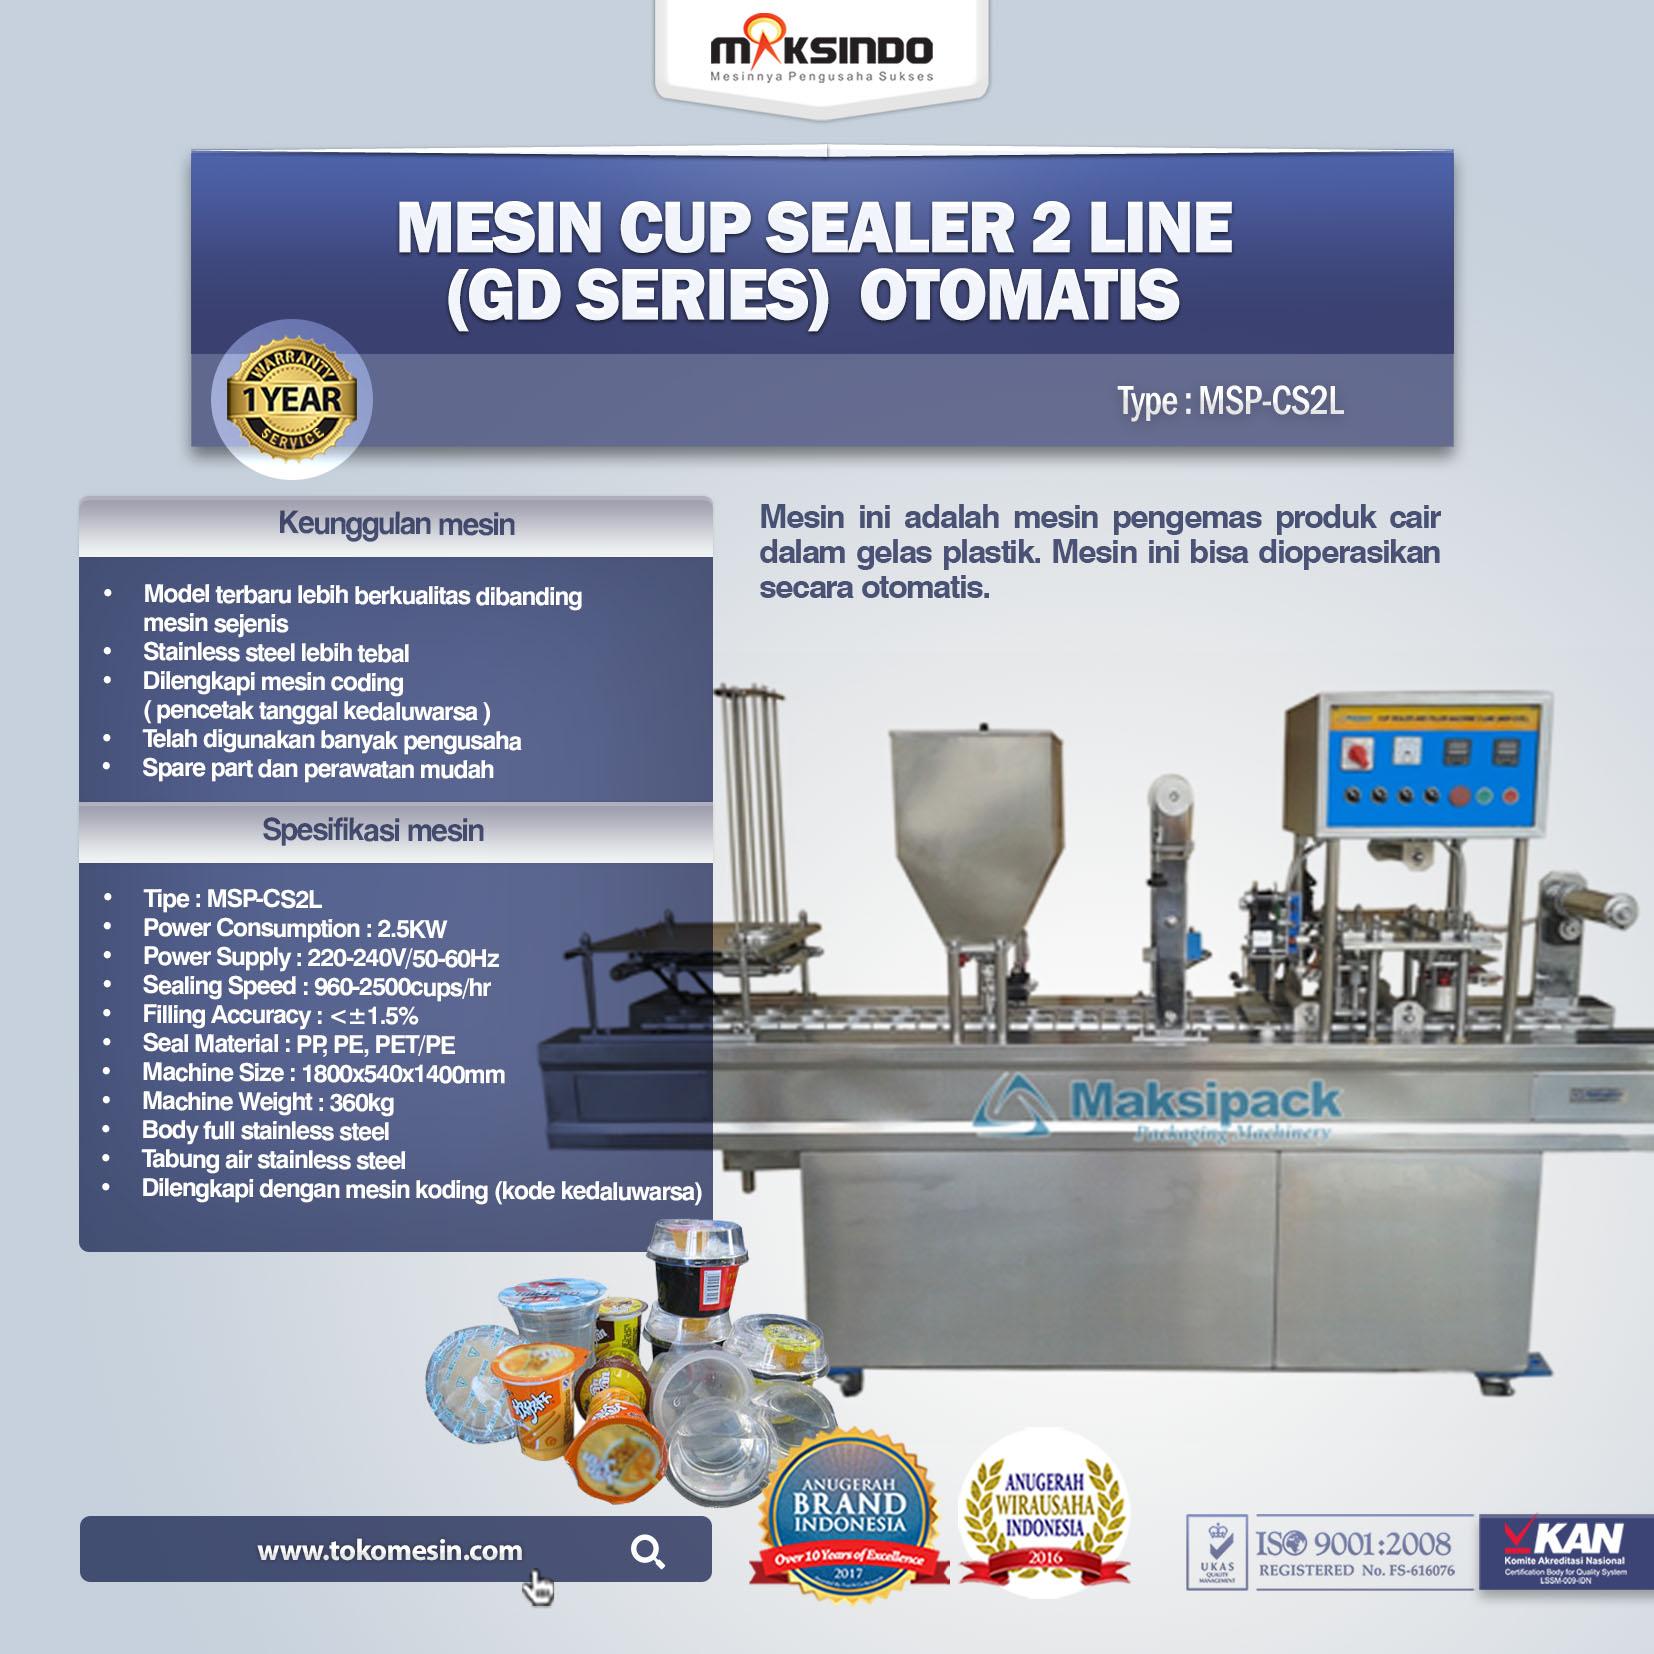 Mesin Cup Sealer Otomatis 2 Line (GD Series) MSP-CS2L